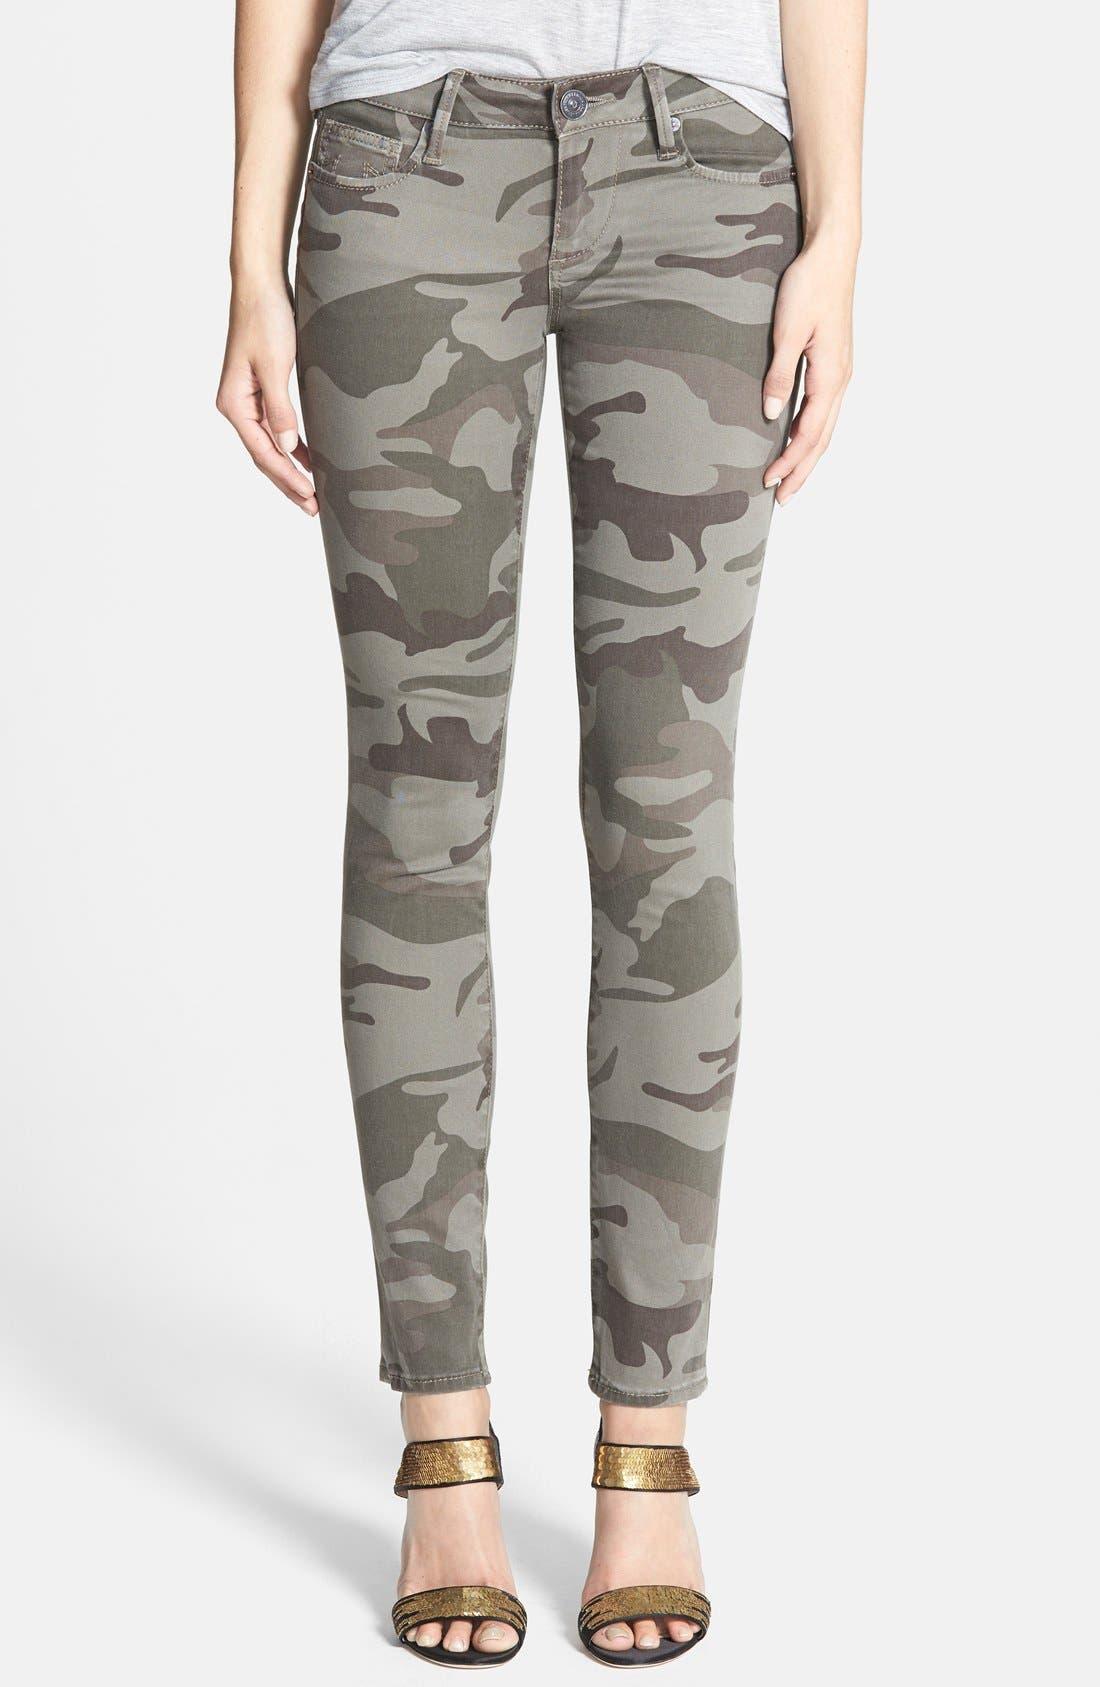 Alternate Image 1 Selected - True Religion Brand Jeans Casey Print Super Skinny Jeans (Olive Camo)